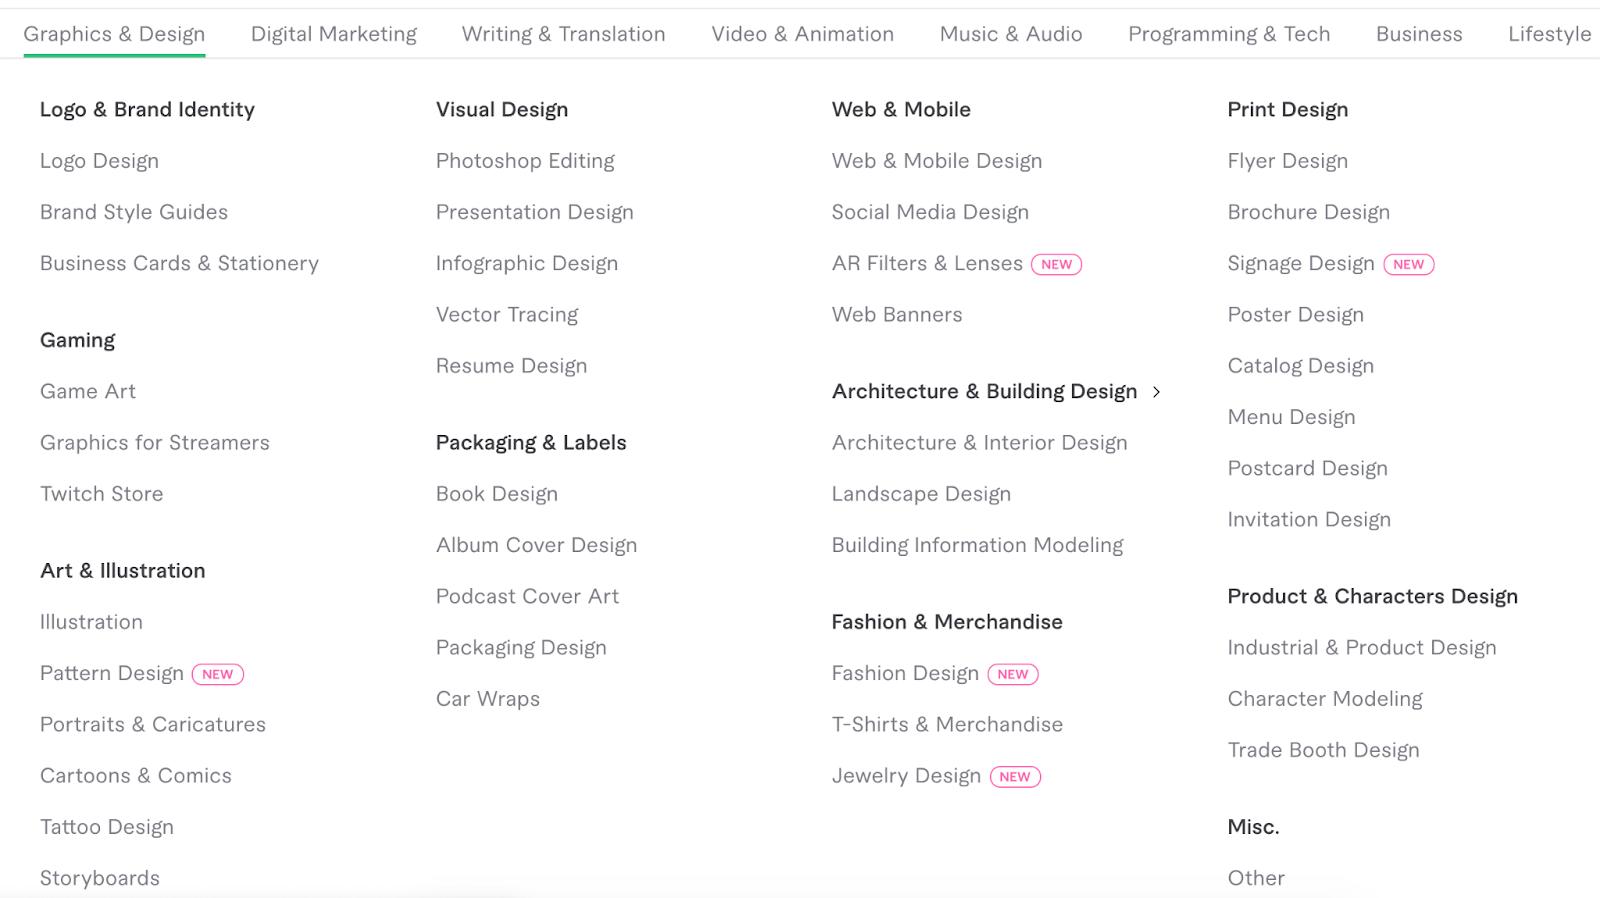 Fiverr navigation menu with Graphic & Design subcategories displayed